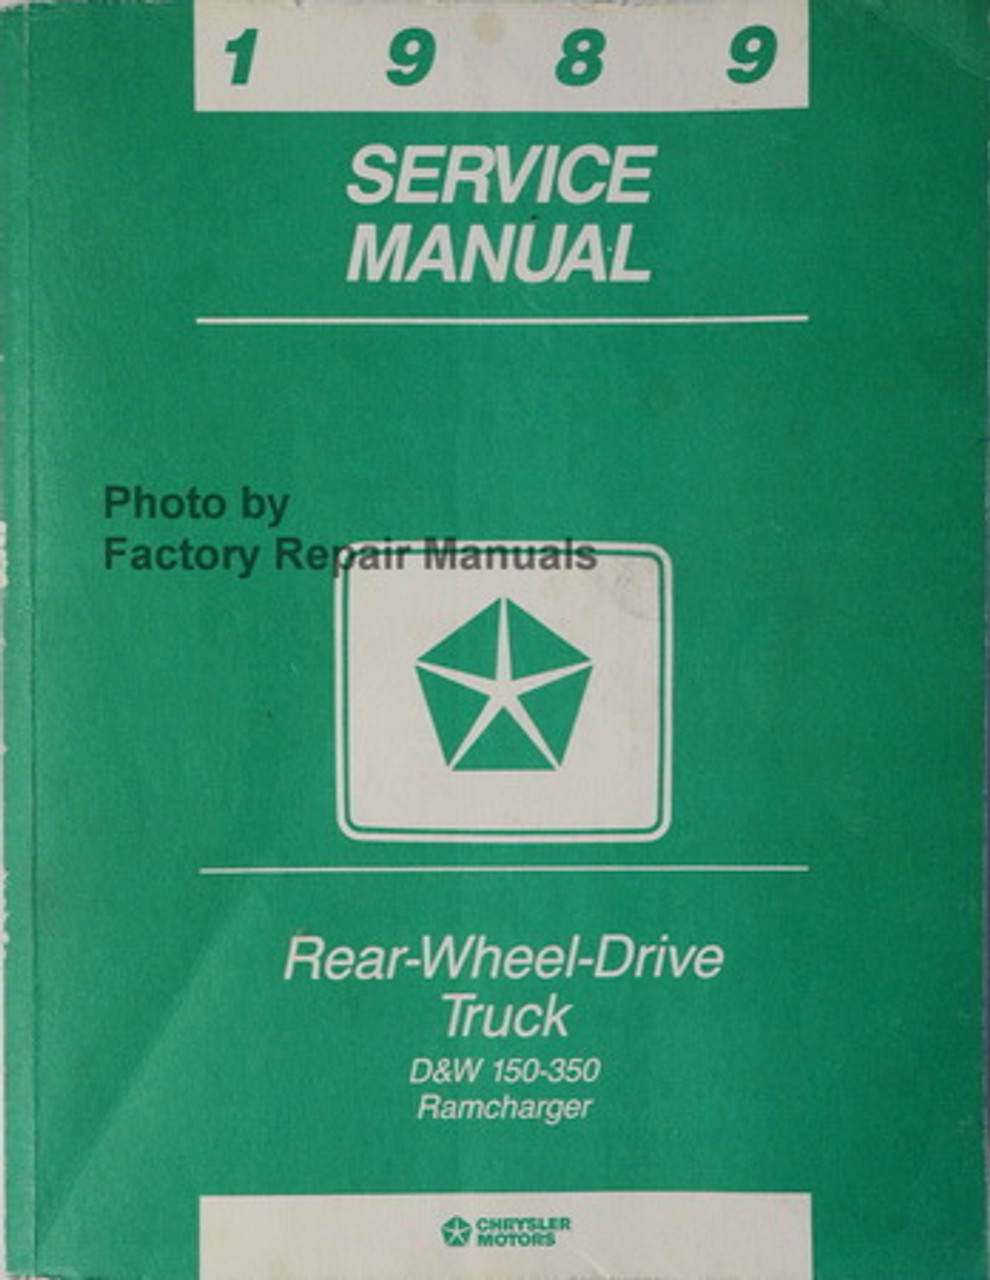 1989 Dodge Caravan Plymouth Voyager Factory Shop Service Repair Manual CD